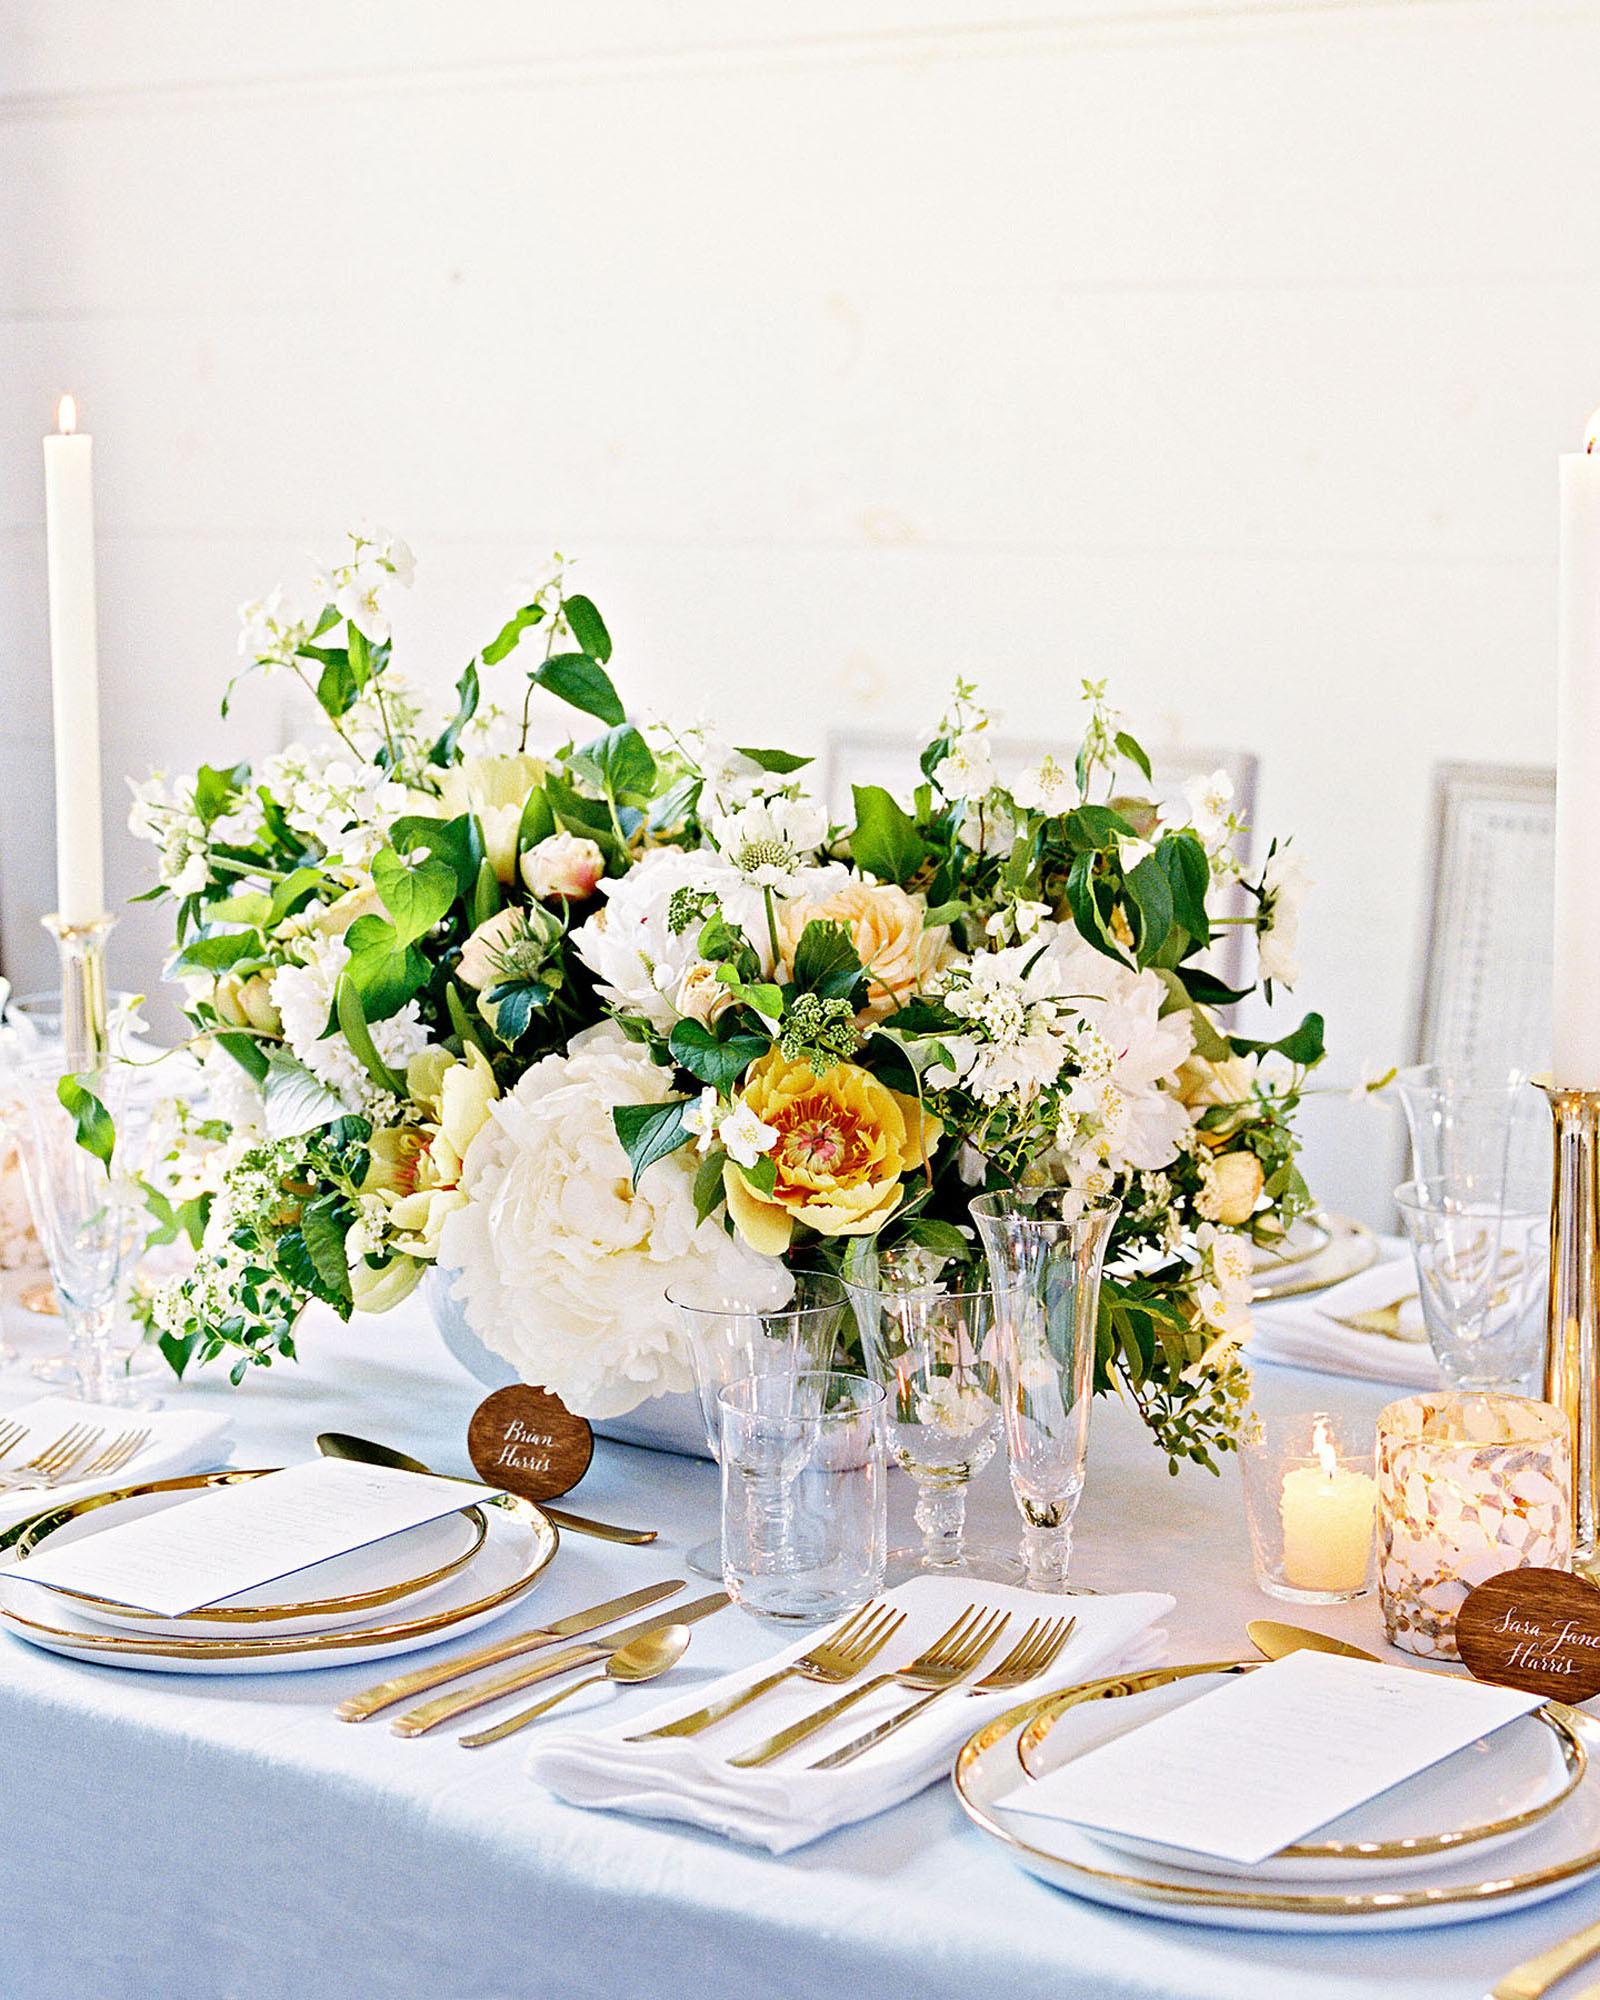 hannah chris wedding north garden va table setting